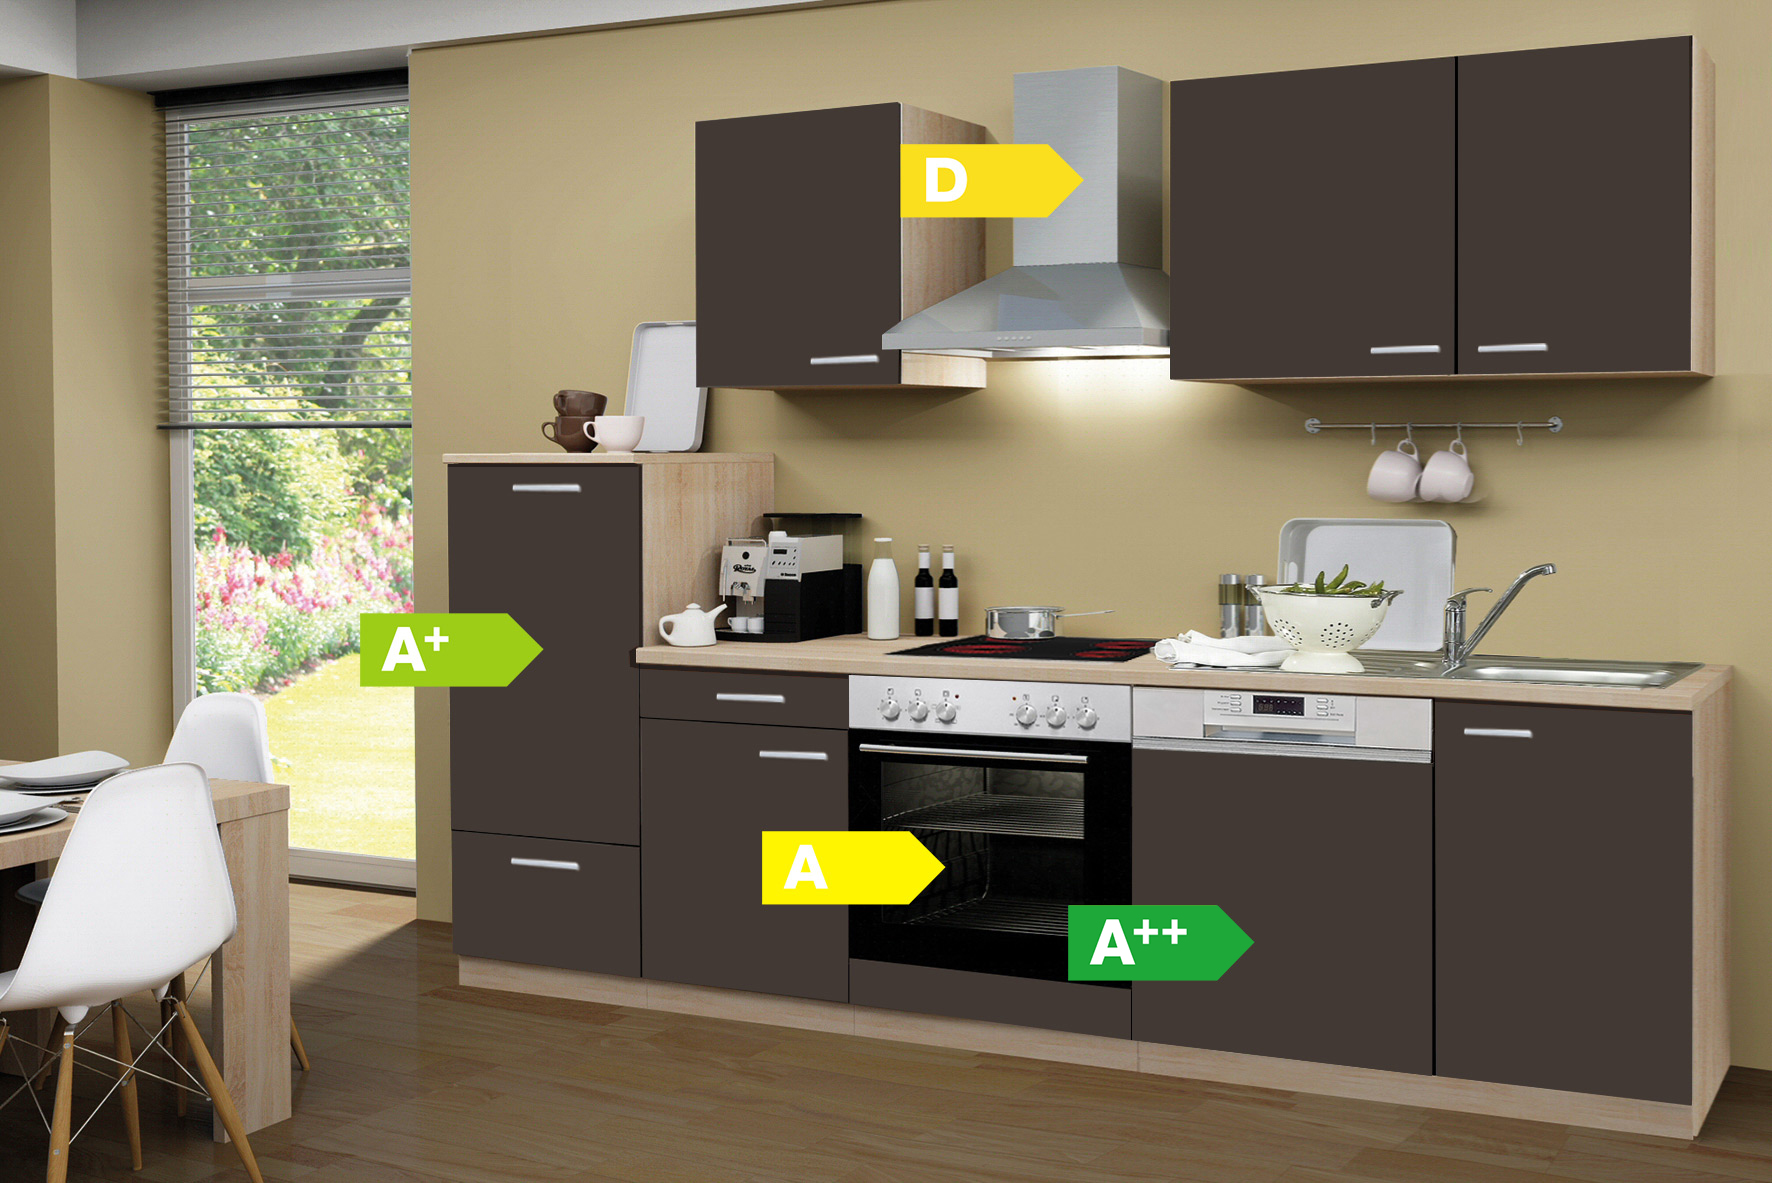 menke k chen k chenzeile classic 280 cm k chenblock k che k chenm bel ebay. Black Bedroom Furniture Sets. Home Design Ideas